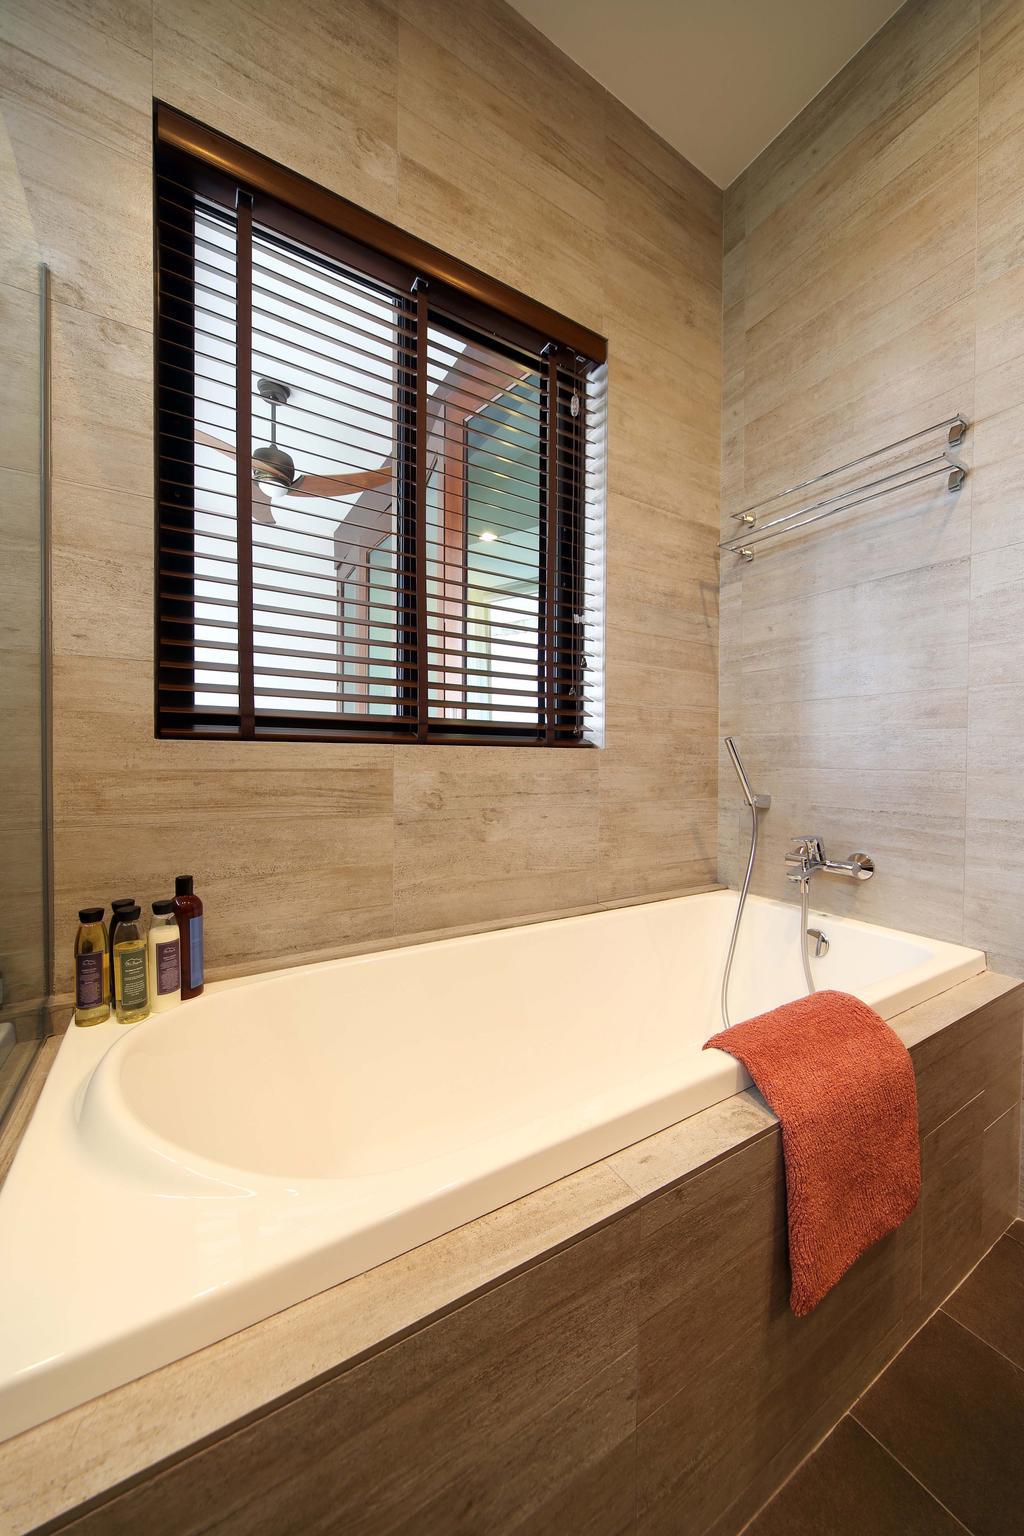 Eclectic, Condo, Bathroom, Hillcrest, Interior Designer, Yonder, Bath Tub, Wall Tiles, Floor Tiles, Blinds, Knitting, Bathtub, Tub, Indoors, Interior Design, Room